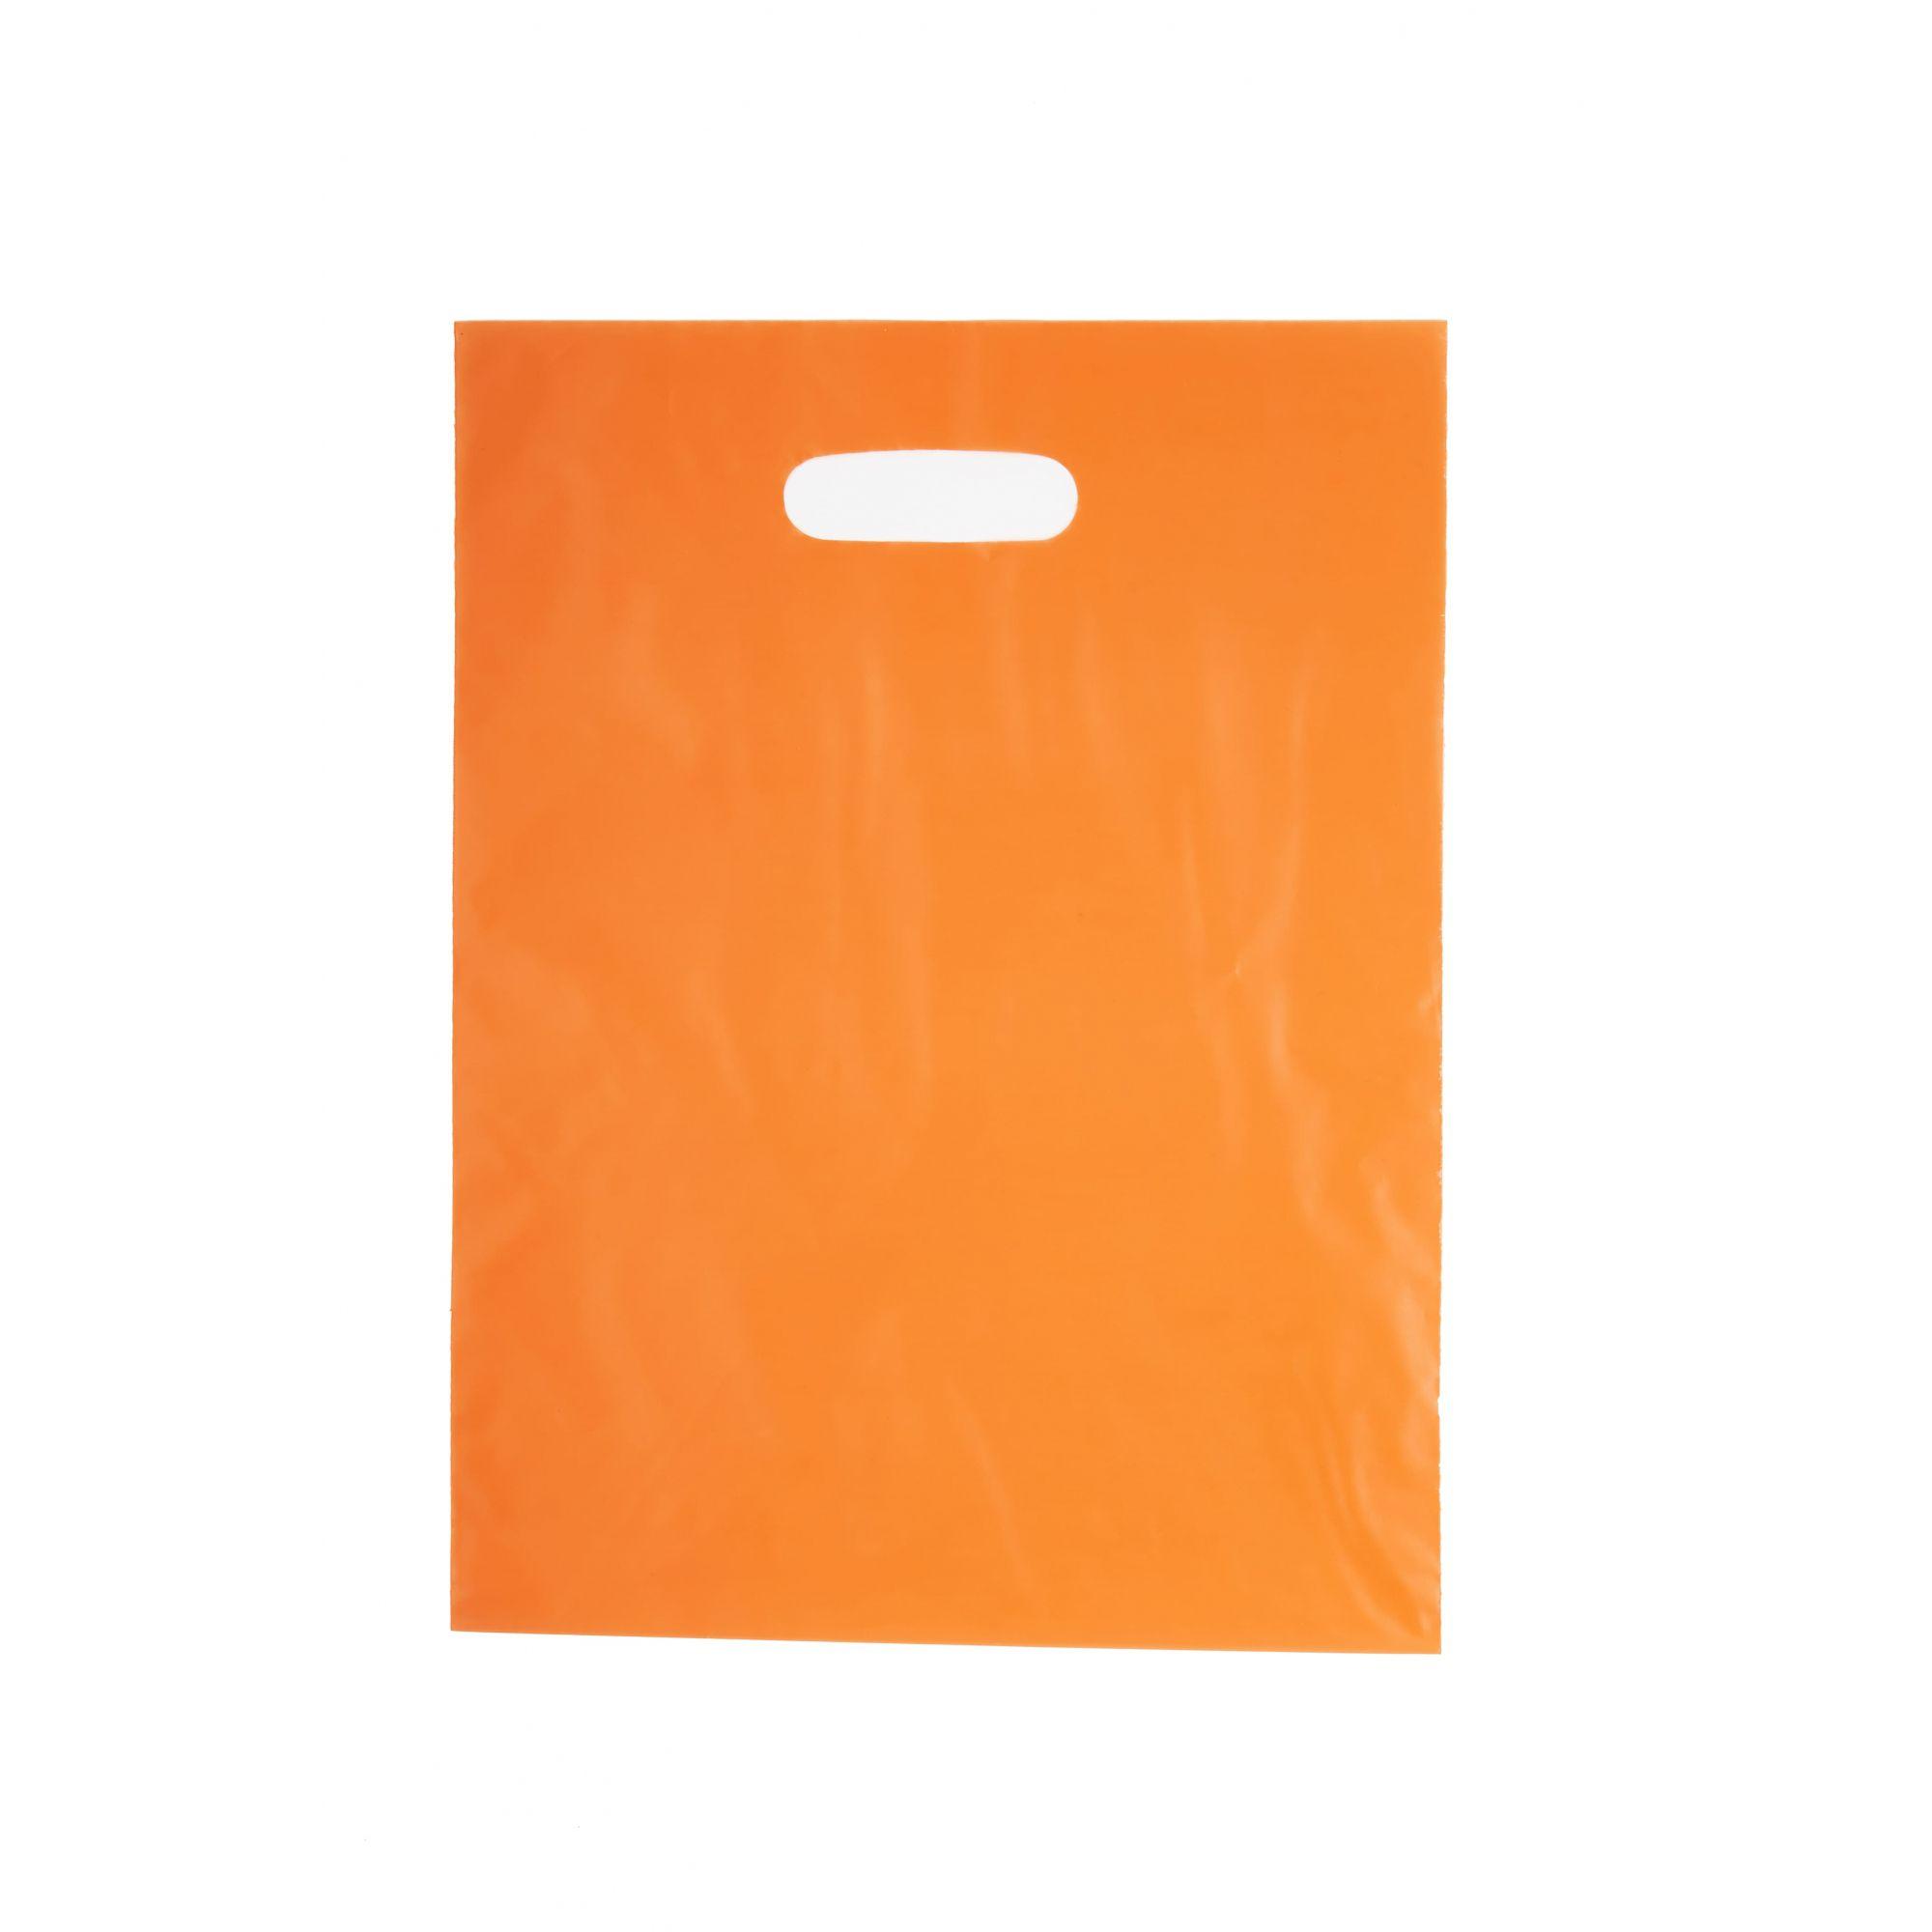 Sacola Plástica 30x40 Laranja - Alça Boca de Palhaço